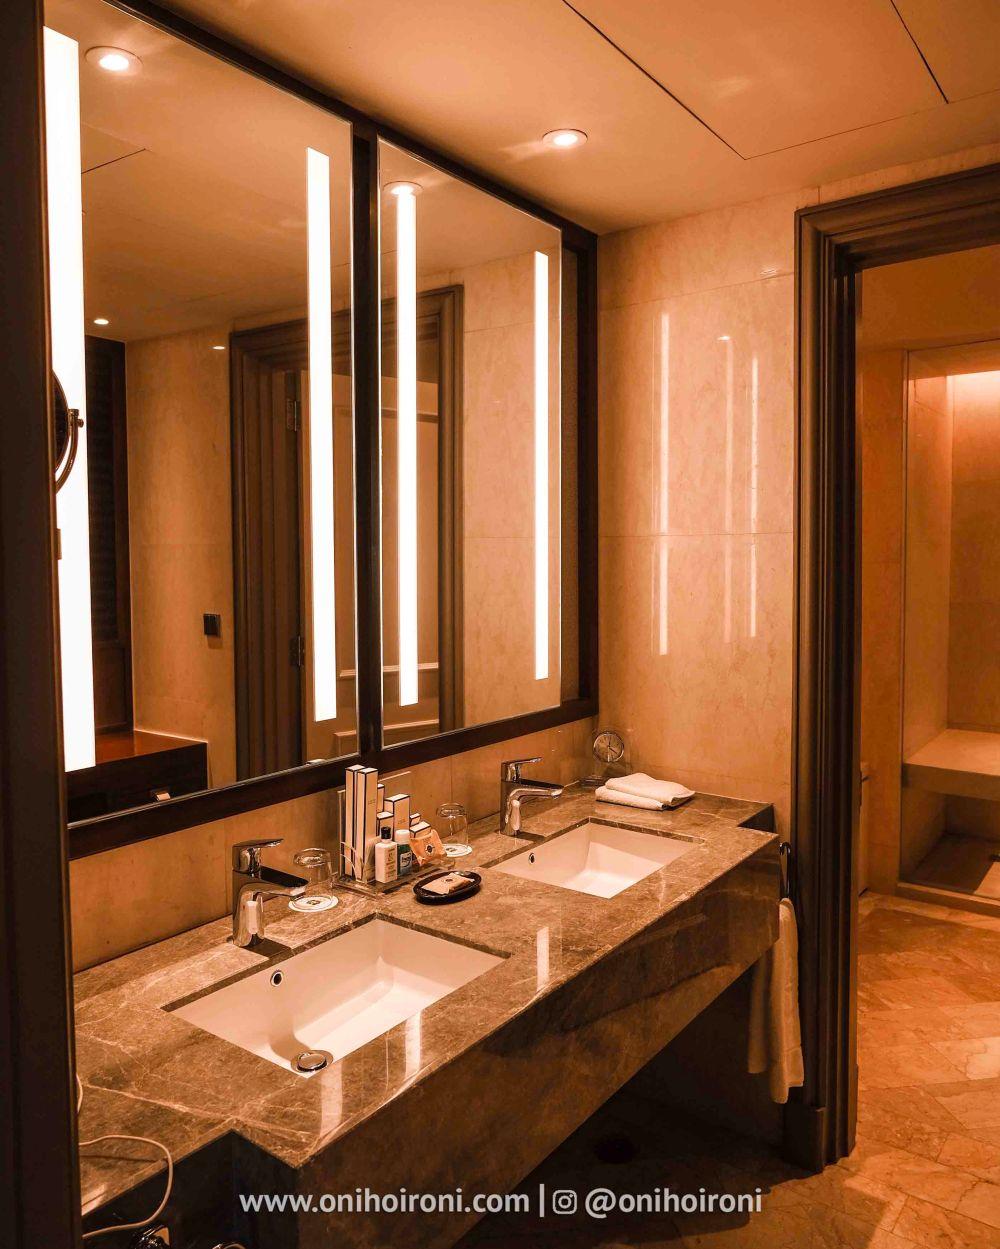 3 Review ROOM KAMAR Shangrila Surabaya Hotel Oni hoironi